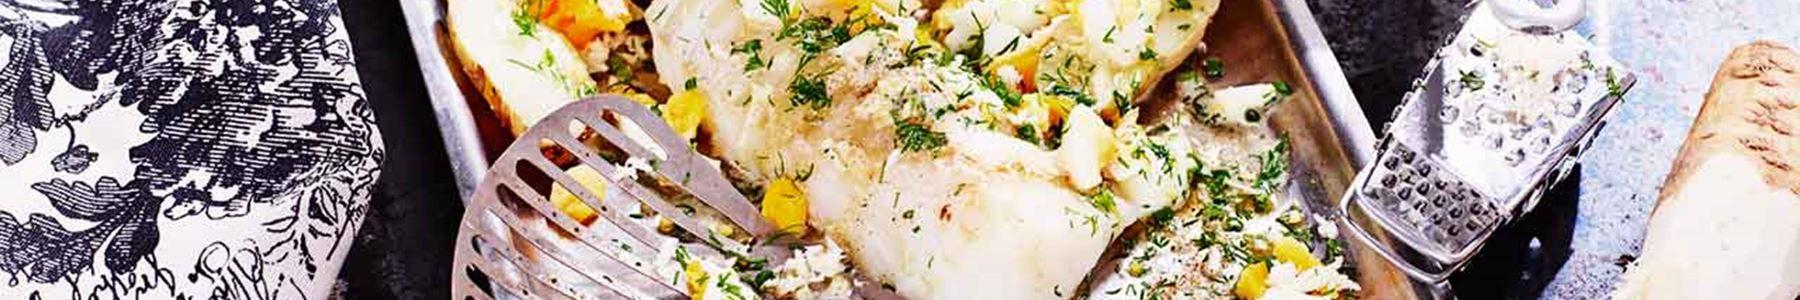 Fisk + Ägg + Pepparrot